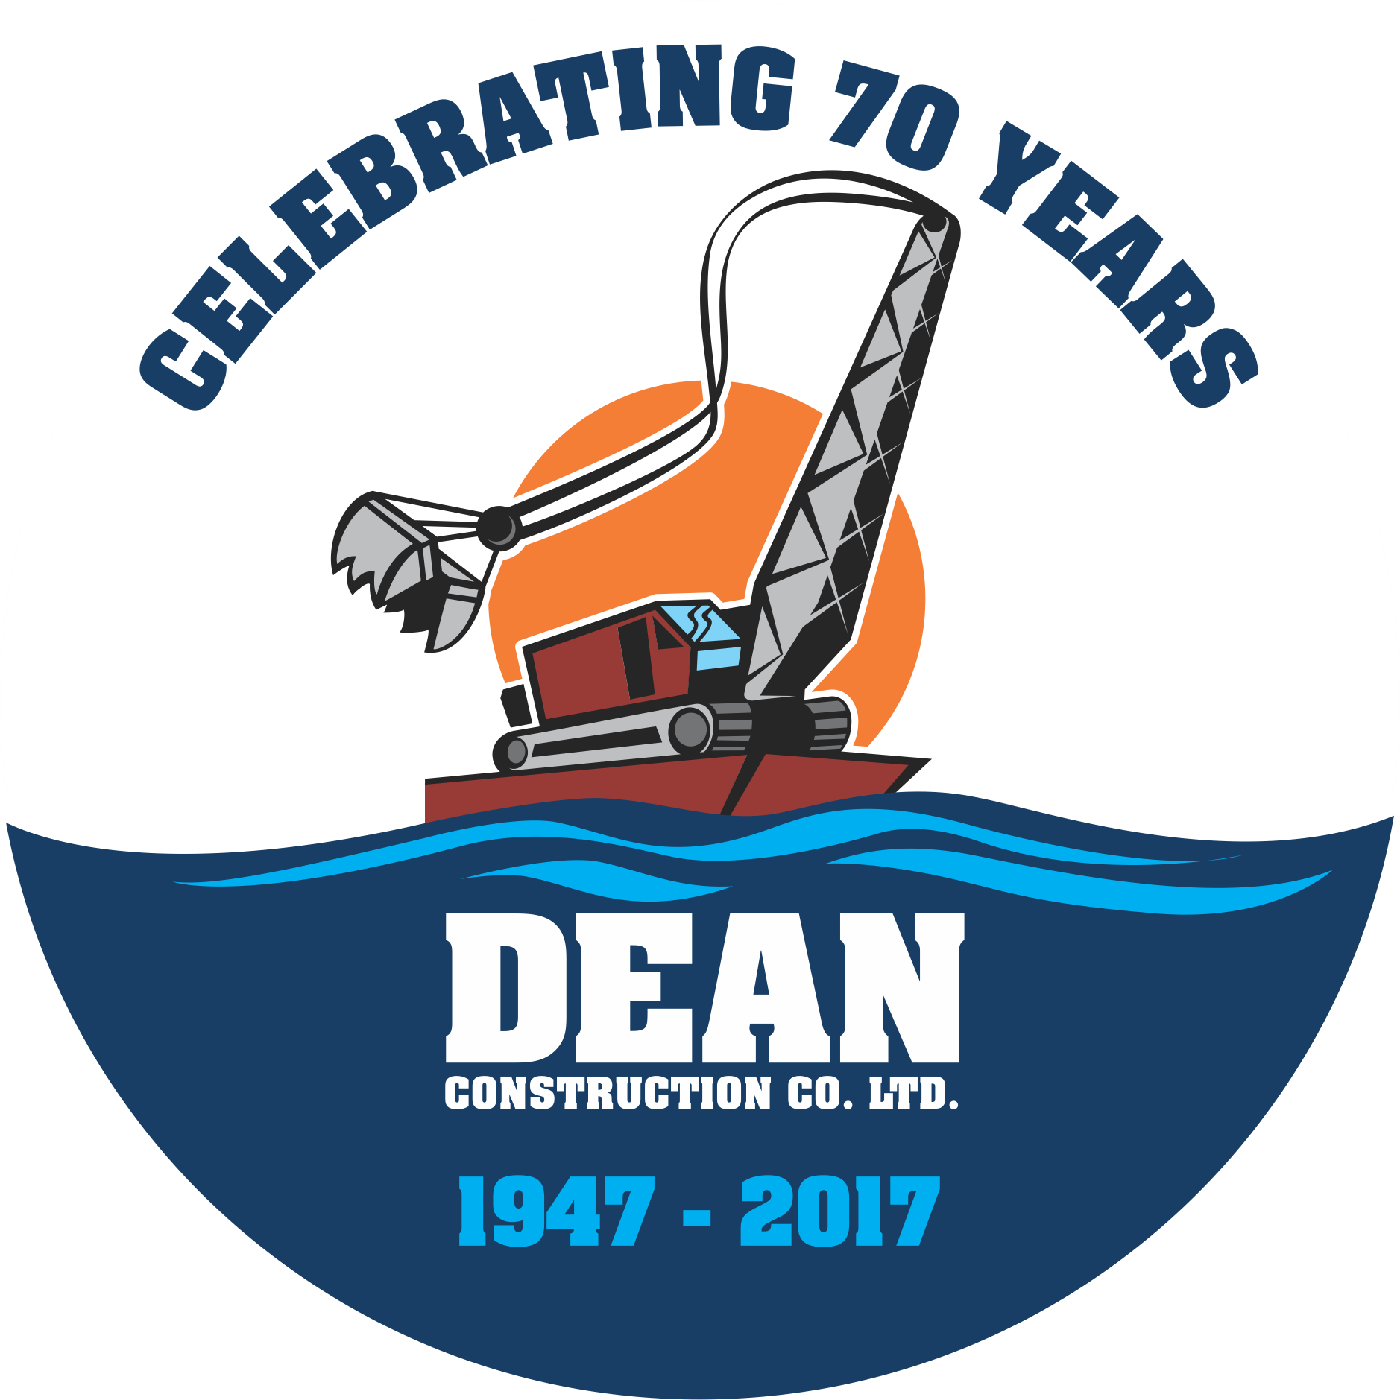 Dean Construction Company 70 Year Logo